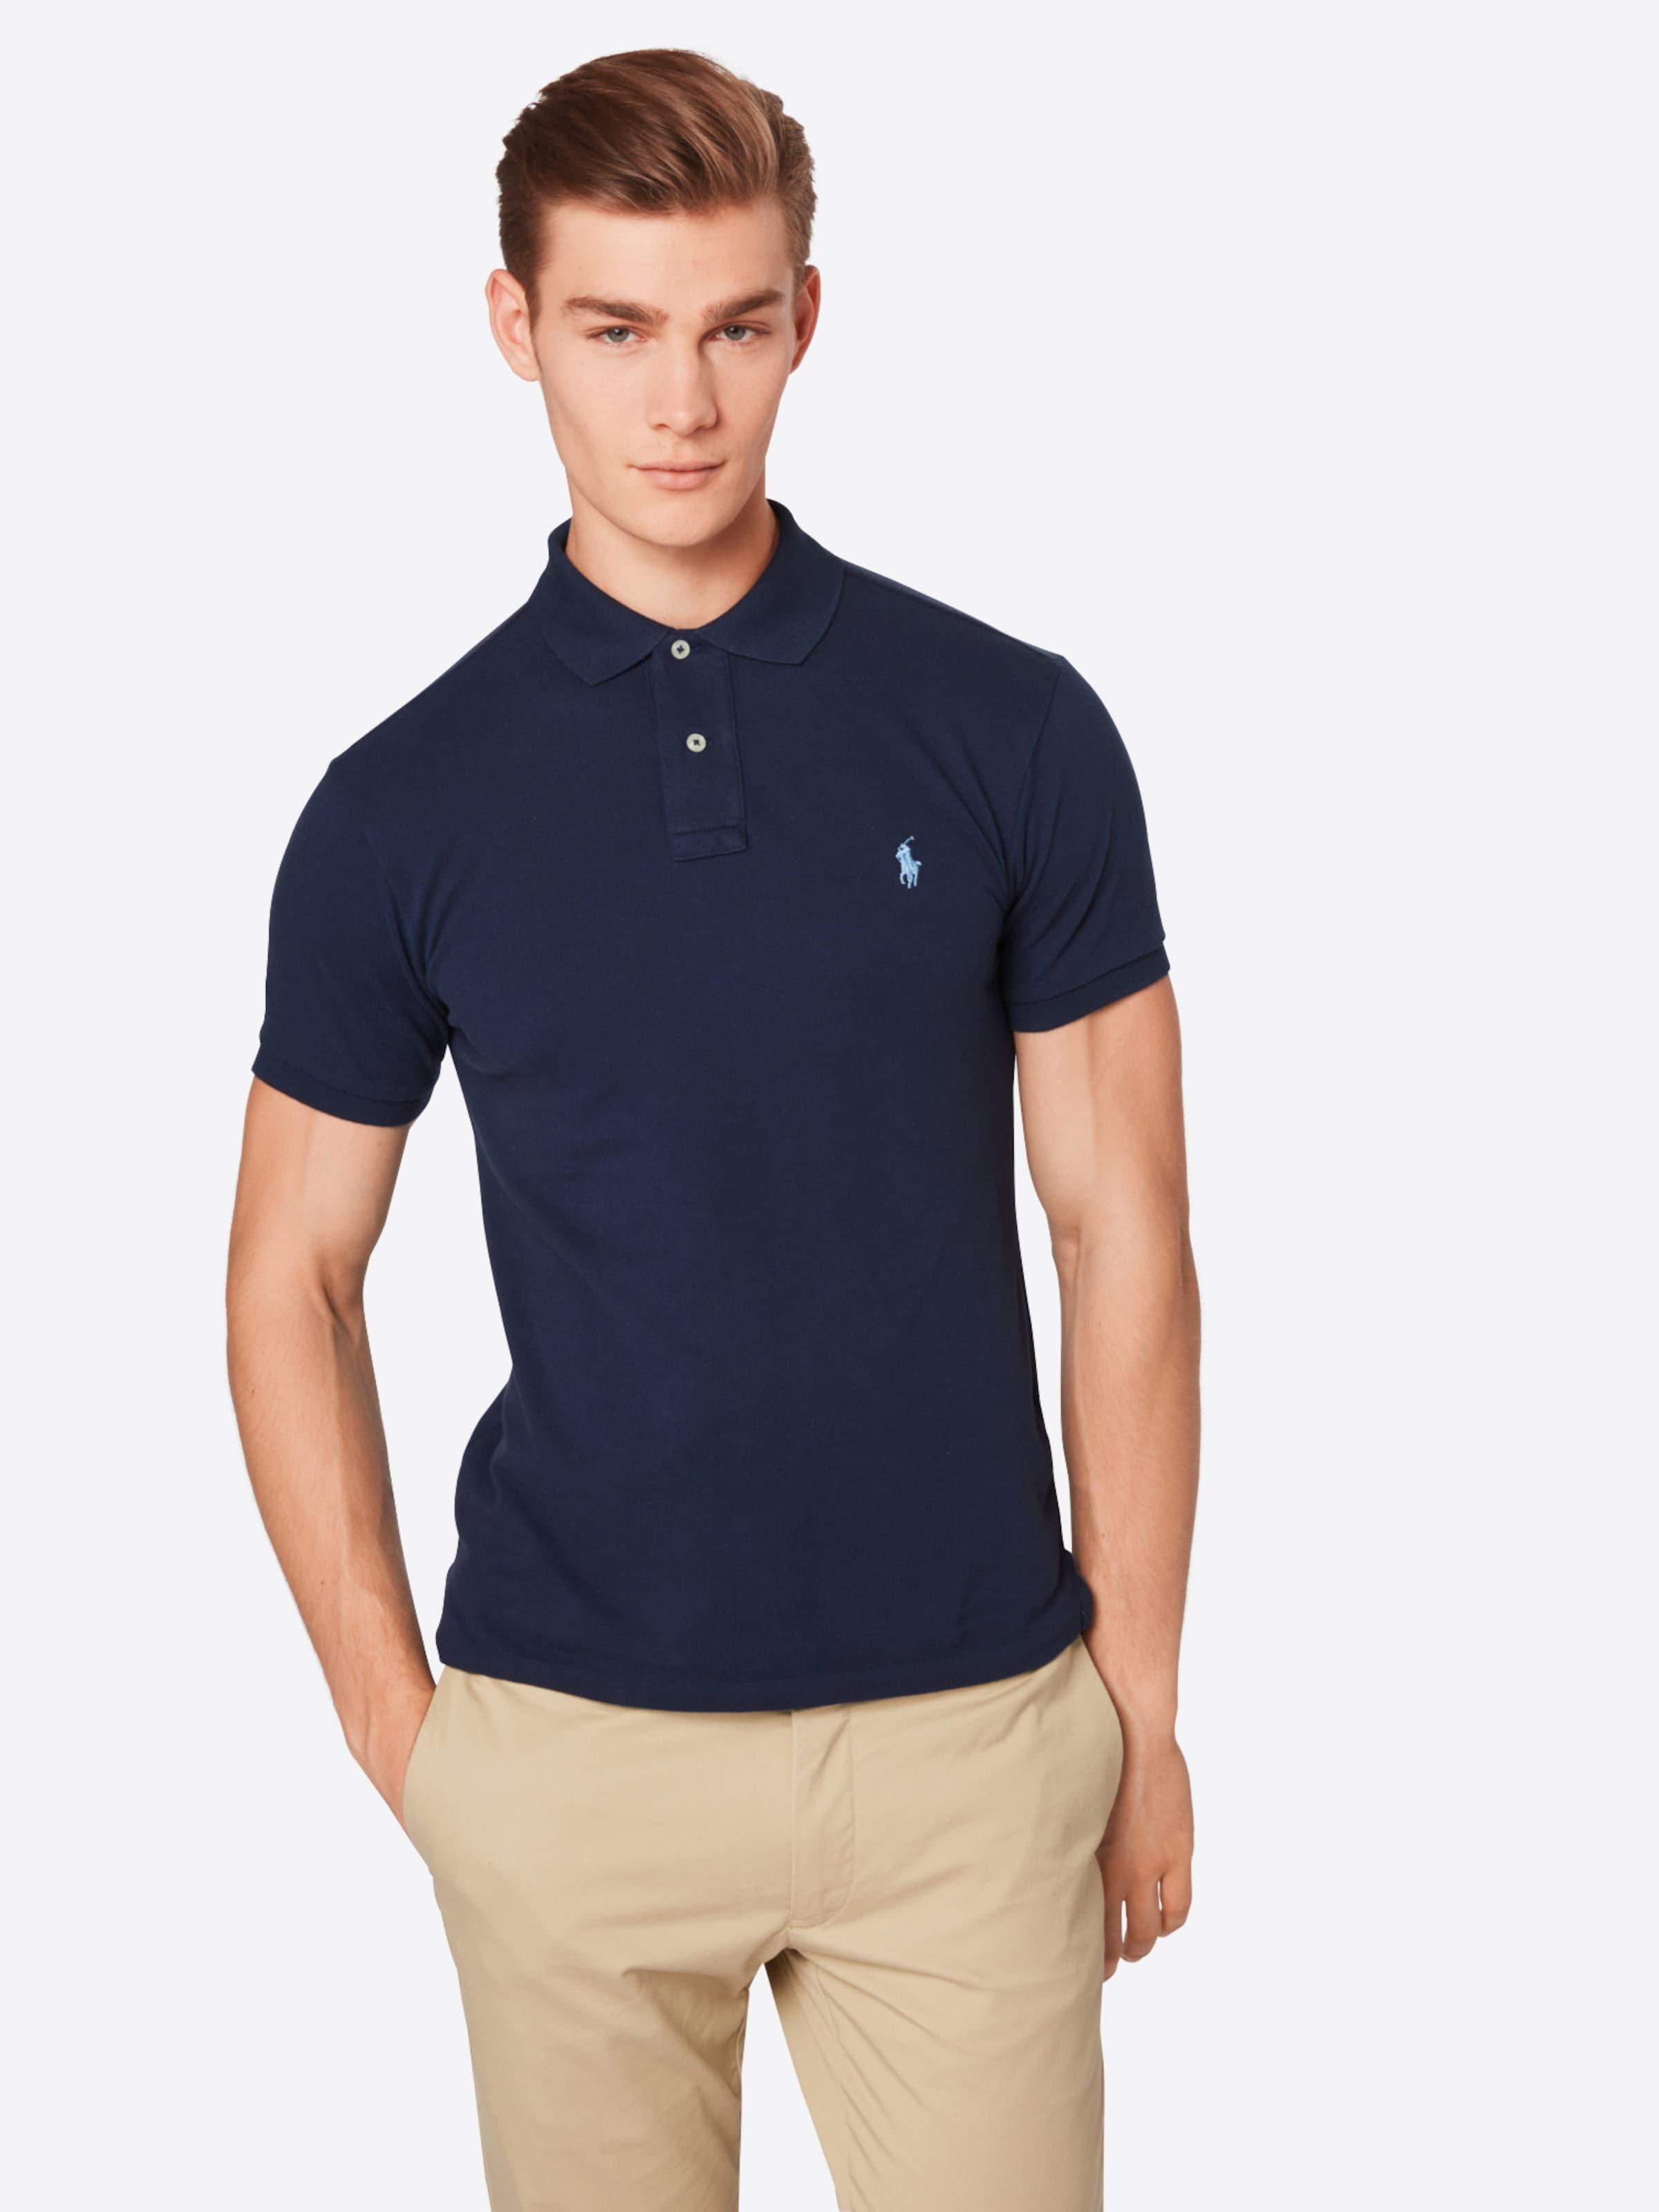 short Sleeve shirt Lauren En Fit Ralph knit' Gris 'ss Polo T Slim 345LqcARj